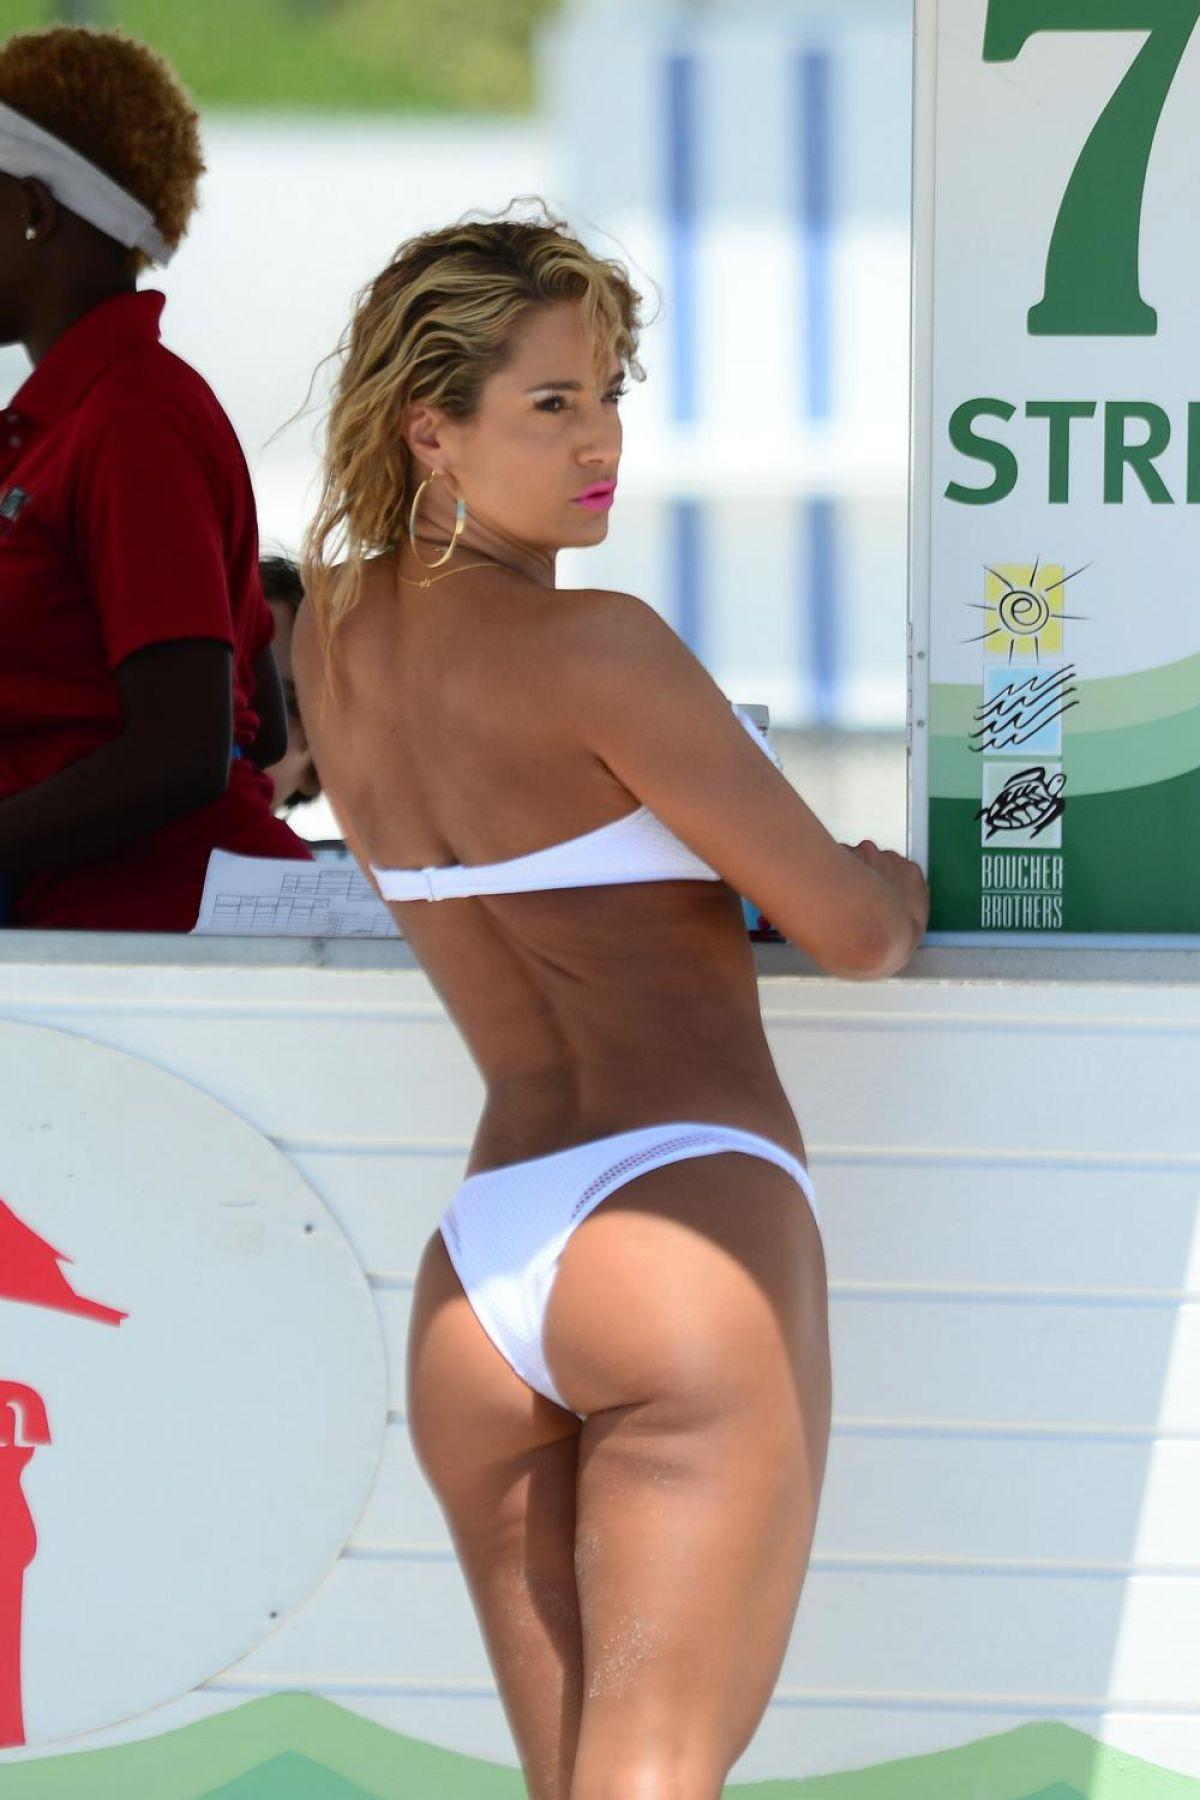 Awesome, Beach bikini miami south guy